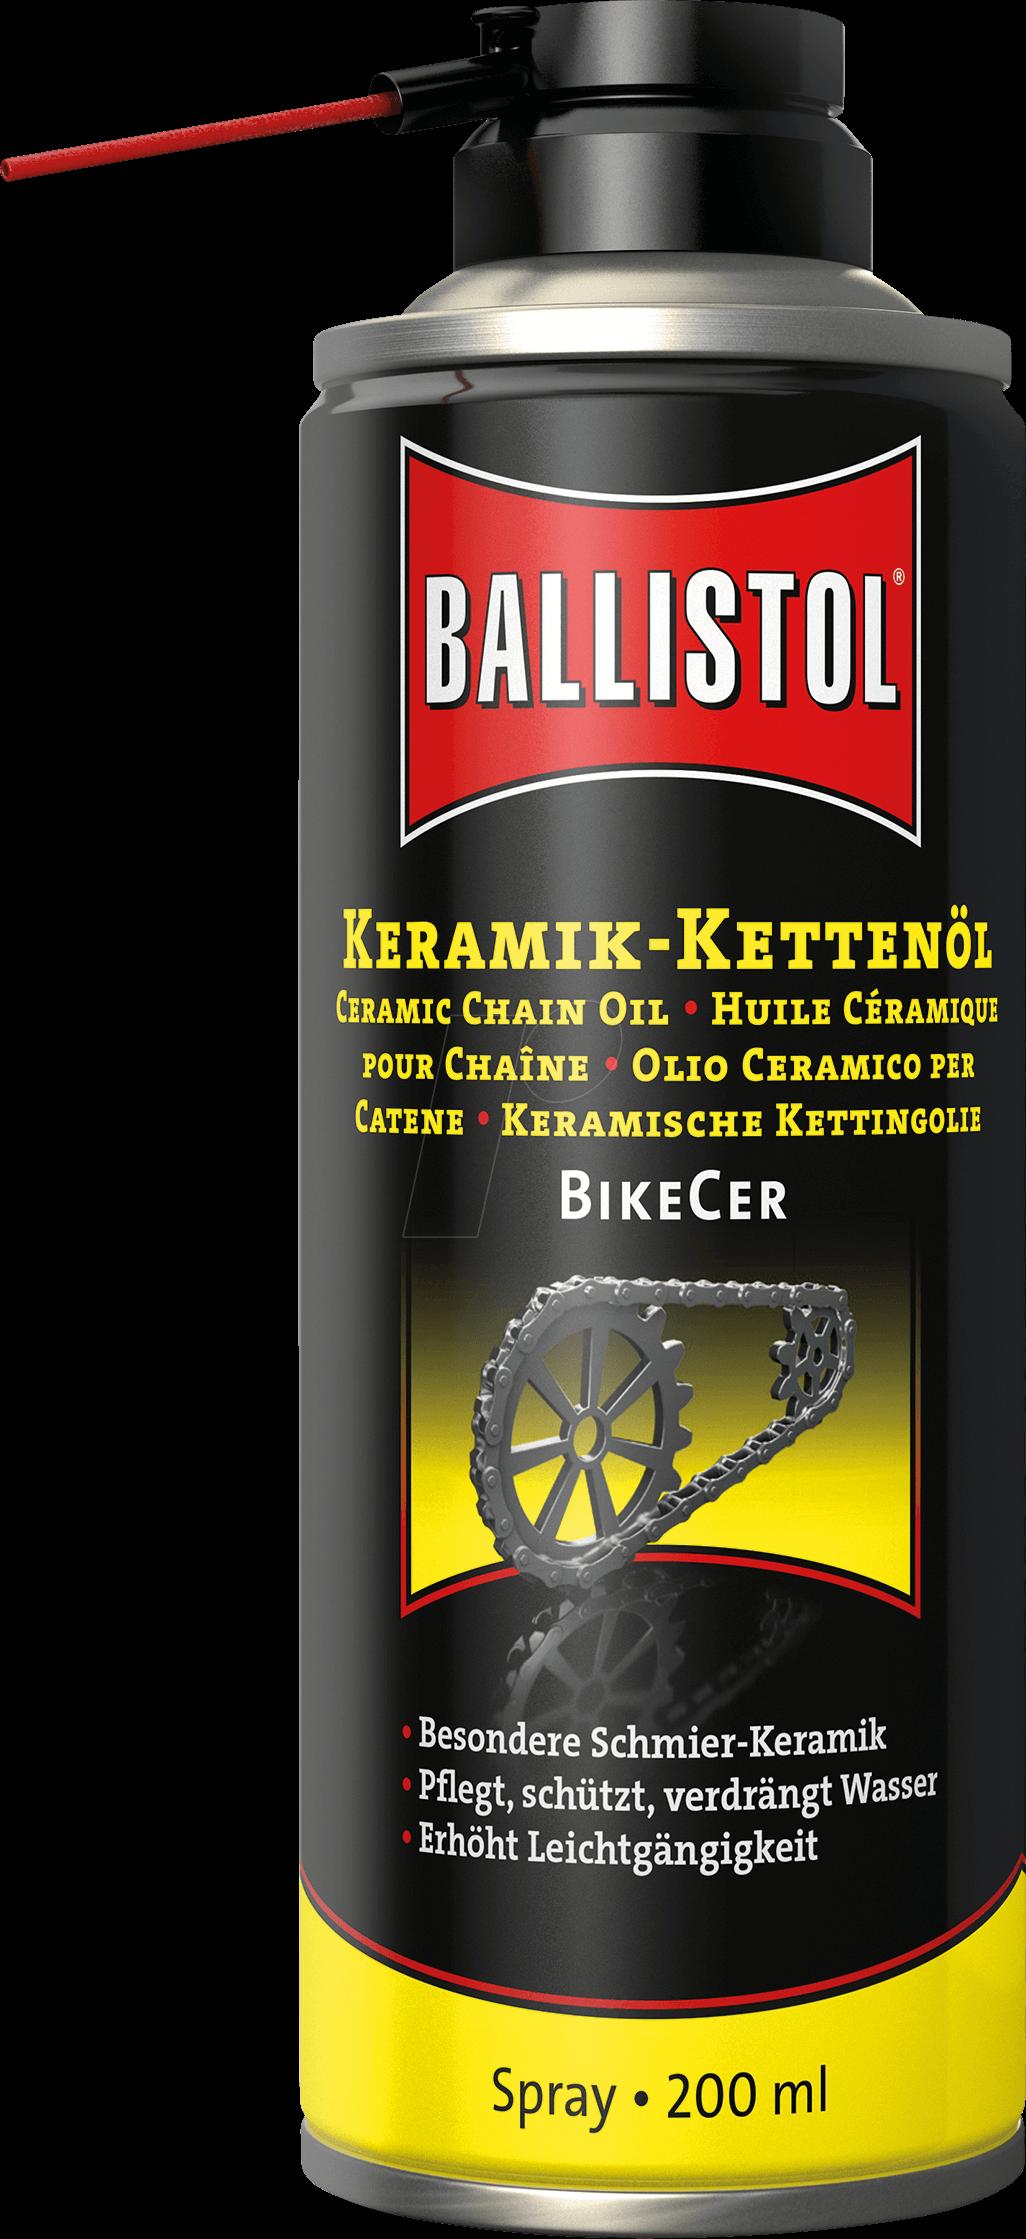 Ballistol BikeCer Keramik Kettenöl 28059 200 ml kaufen